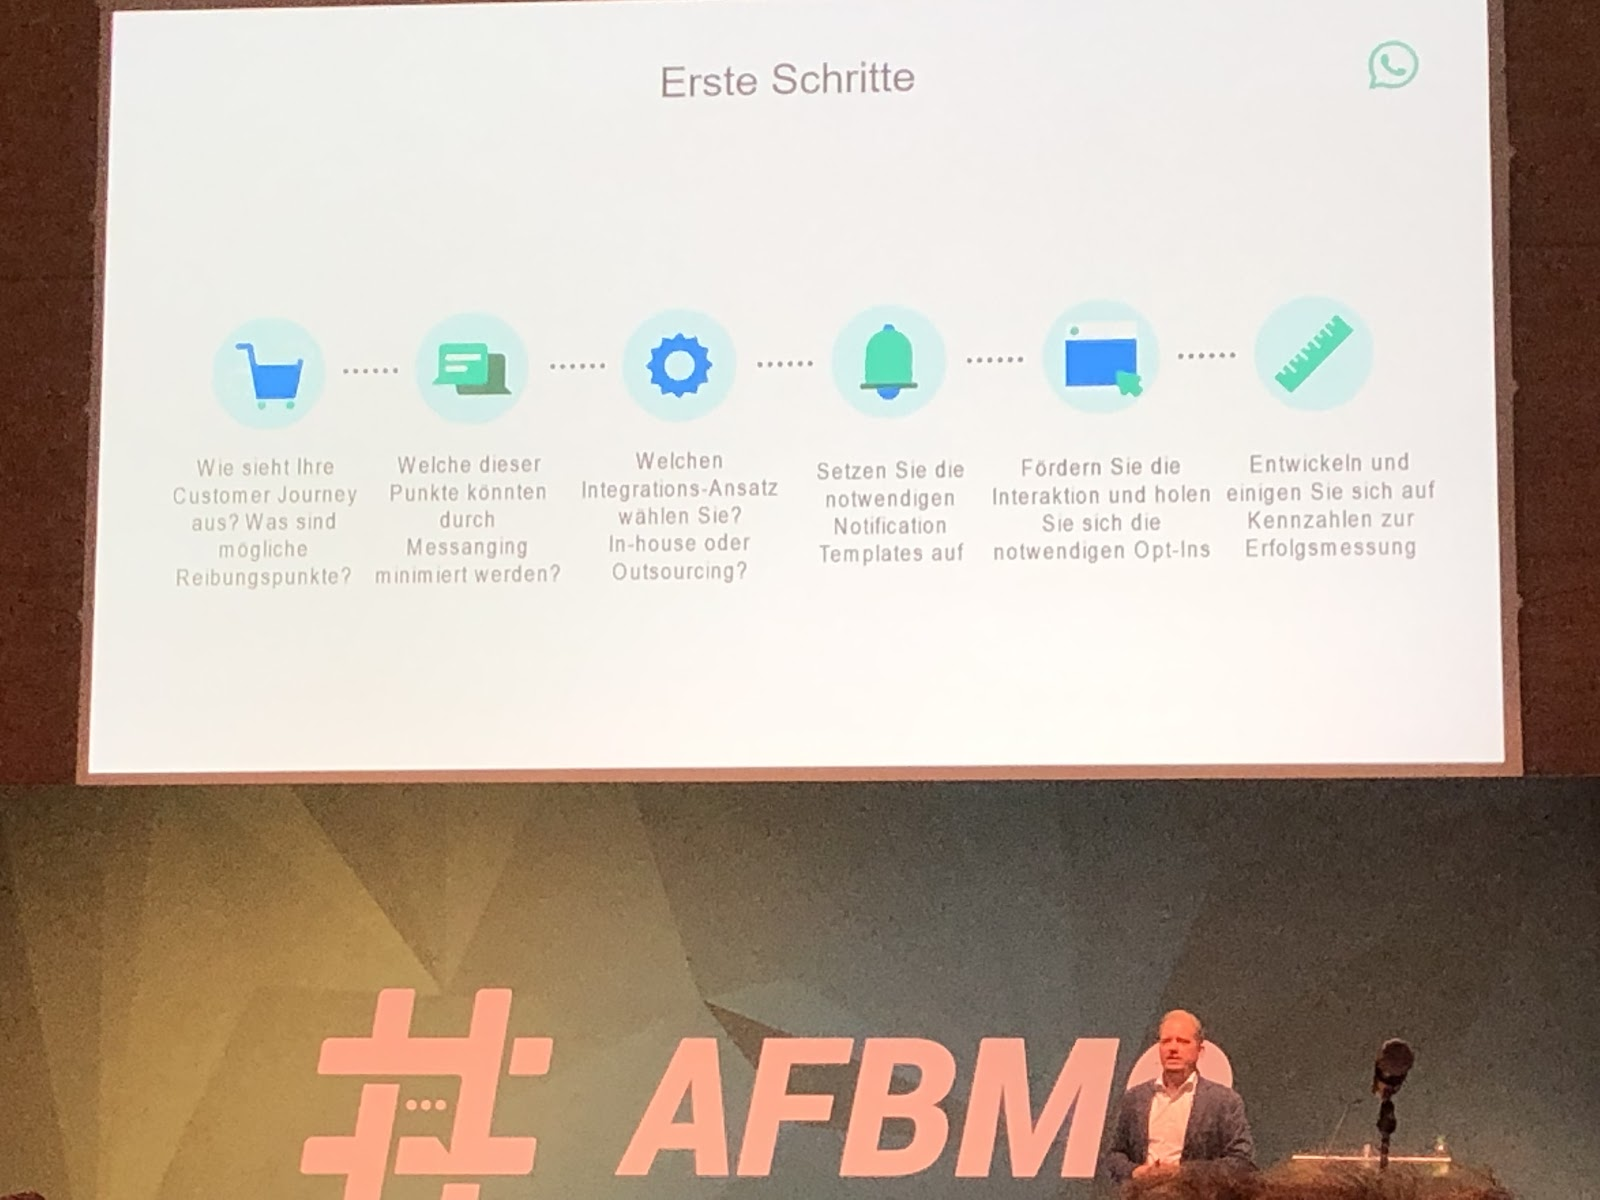 AFBMC WhatsApp Erste Schritte